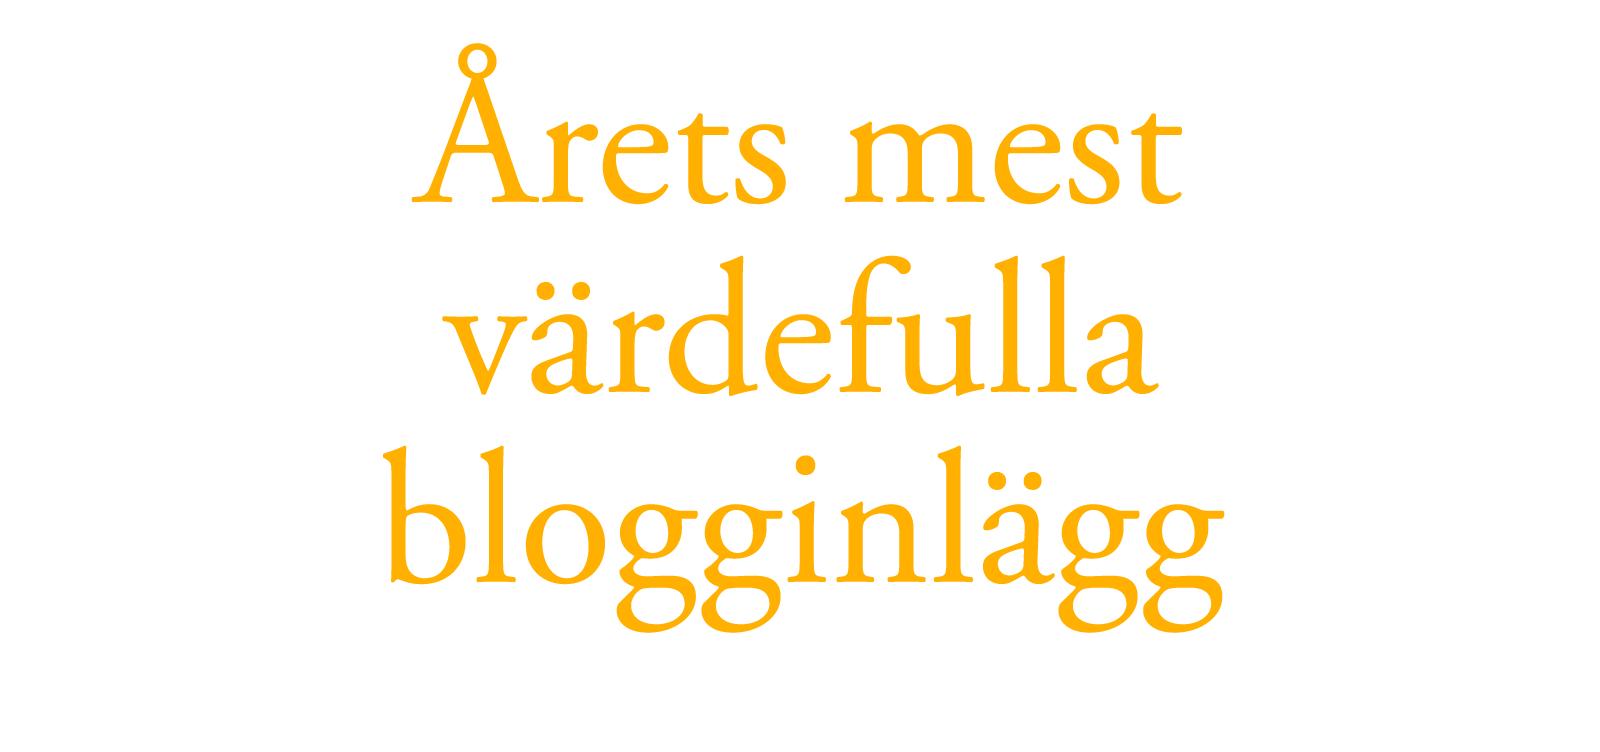 arets-blogginlagg